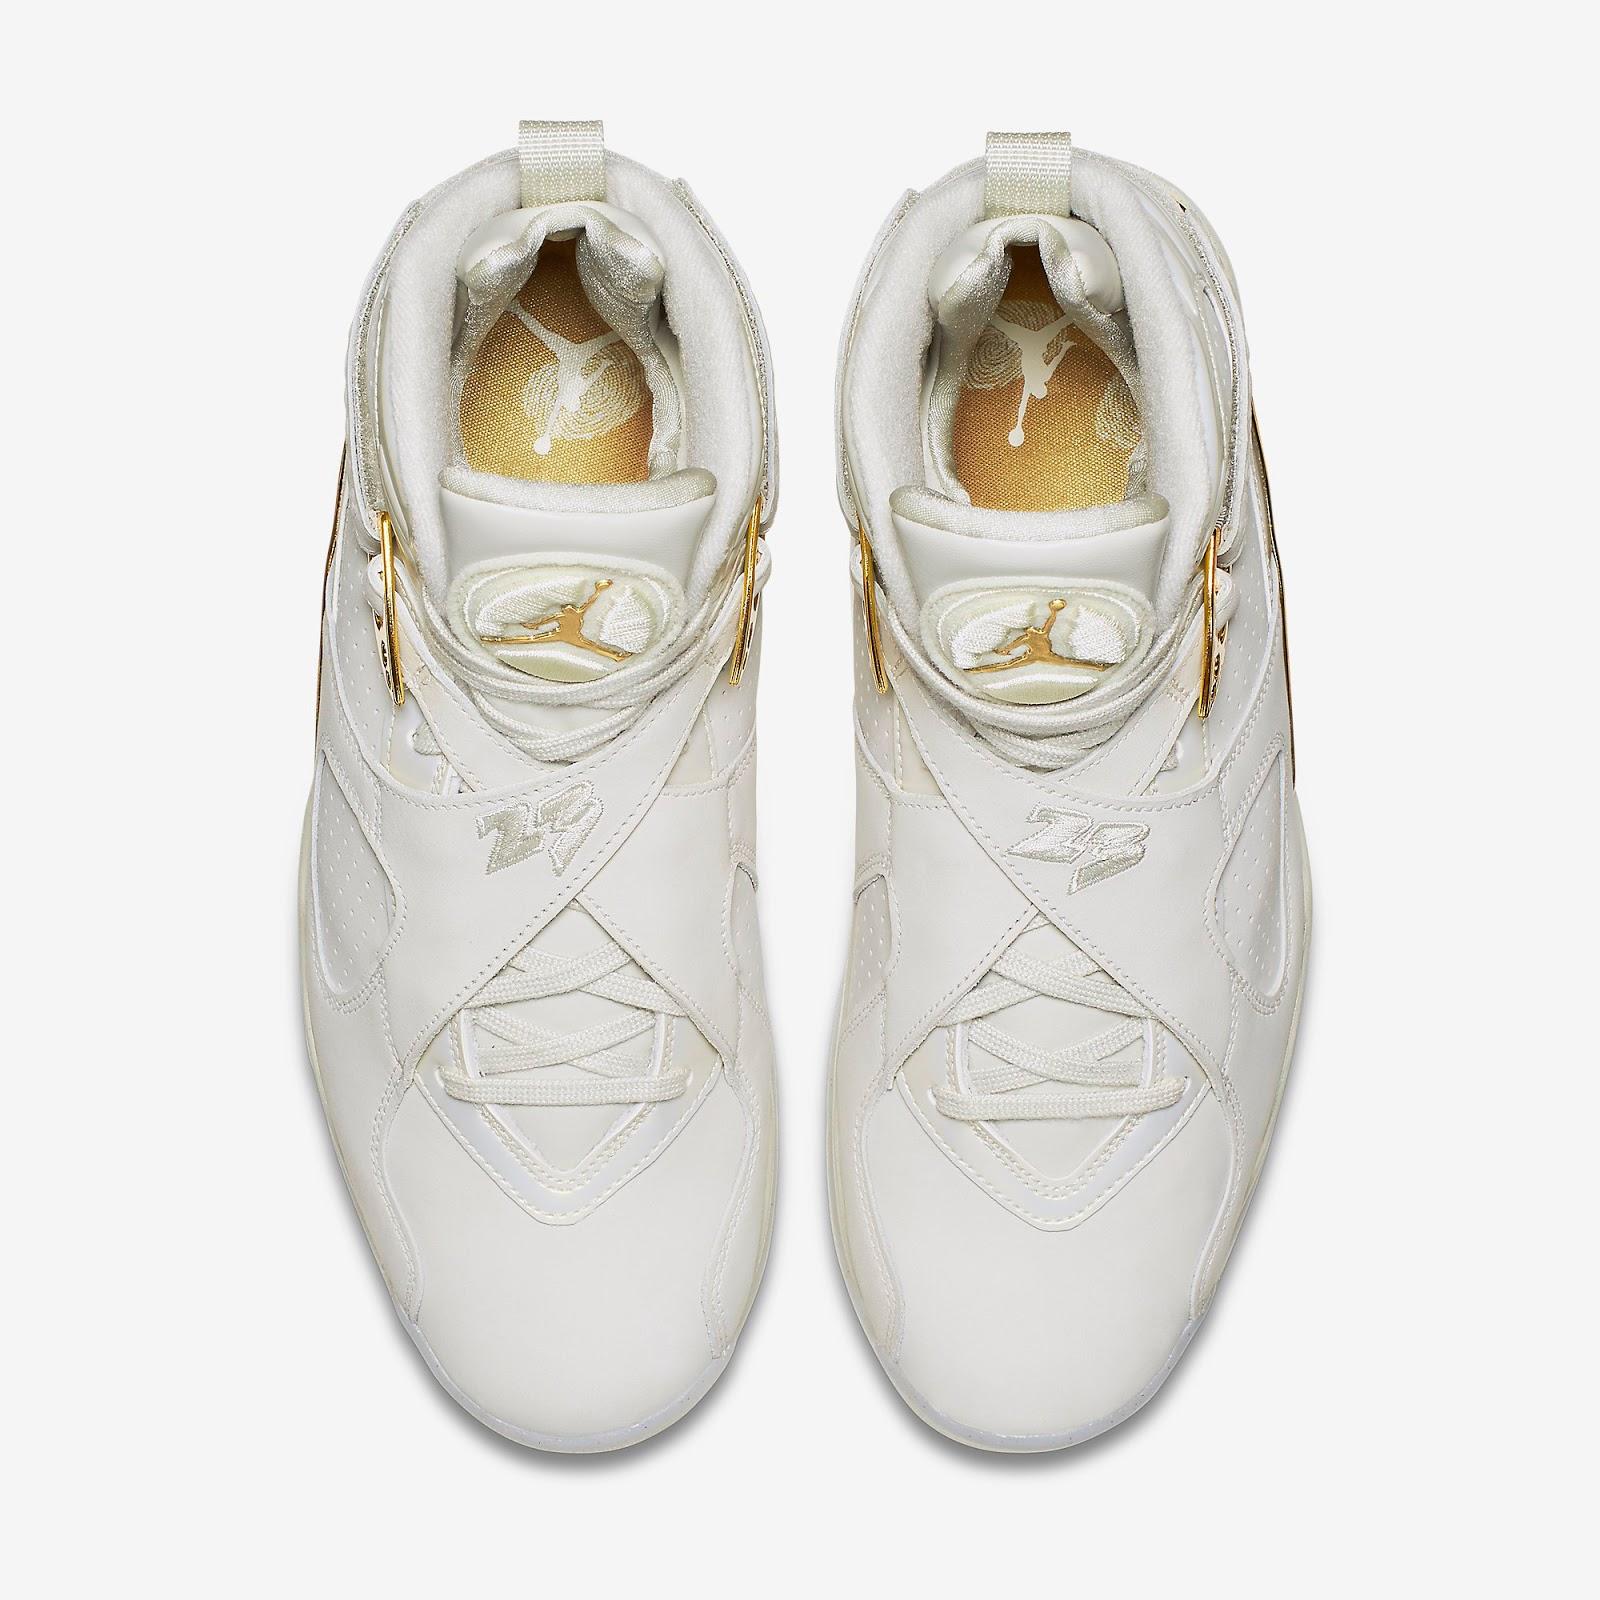 free shipping 96059 aeb09 ... ajordanxi Your 1 Source For Sneaker Release Dates Air Jordan 8 Retro CC  ...